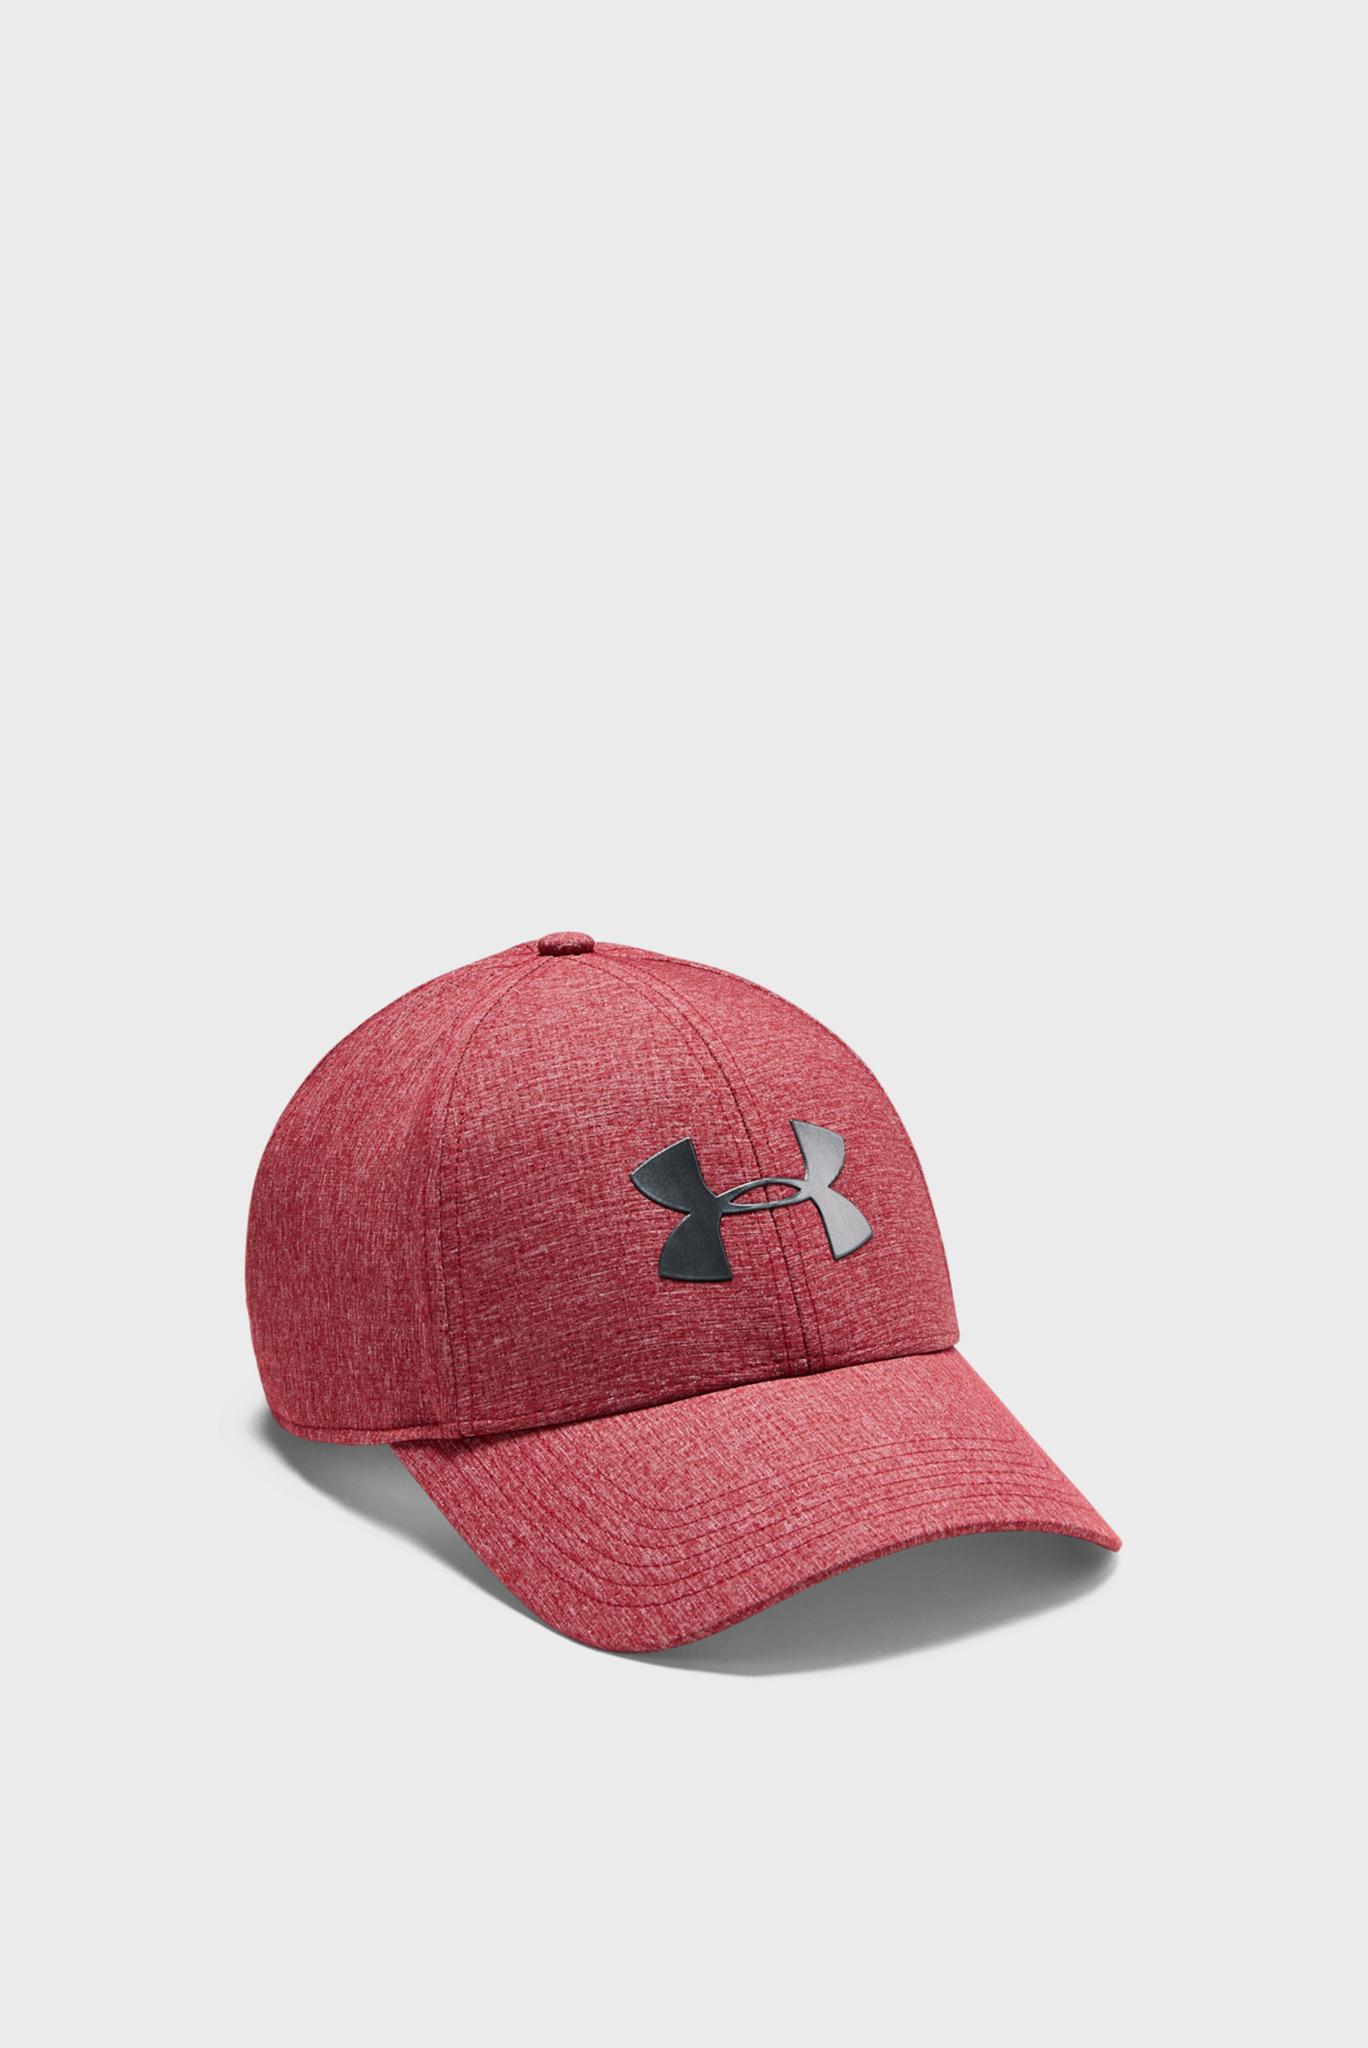 Мужская красная кепка UA Adjustable Airvent Cool Cap-RED Under Armour